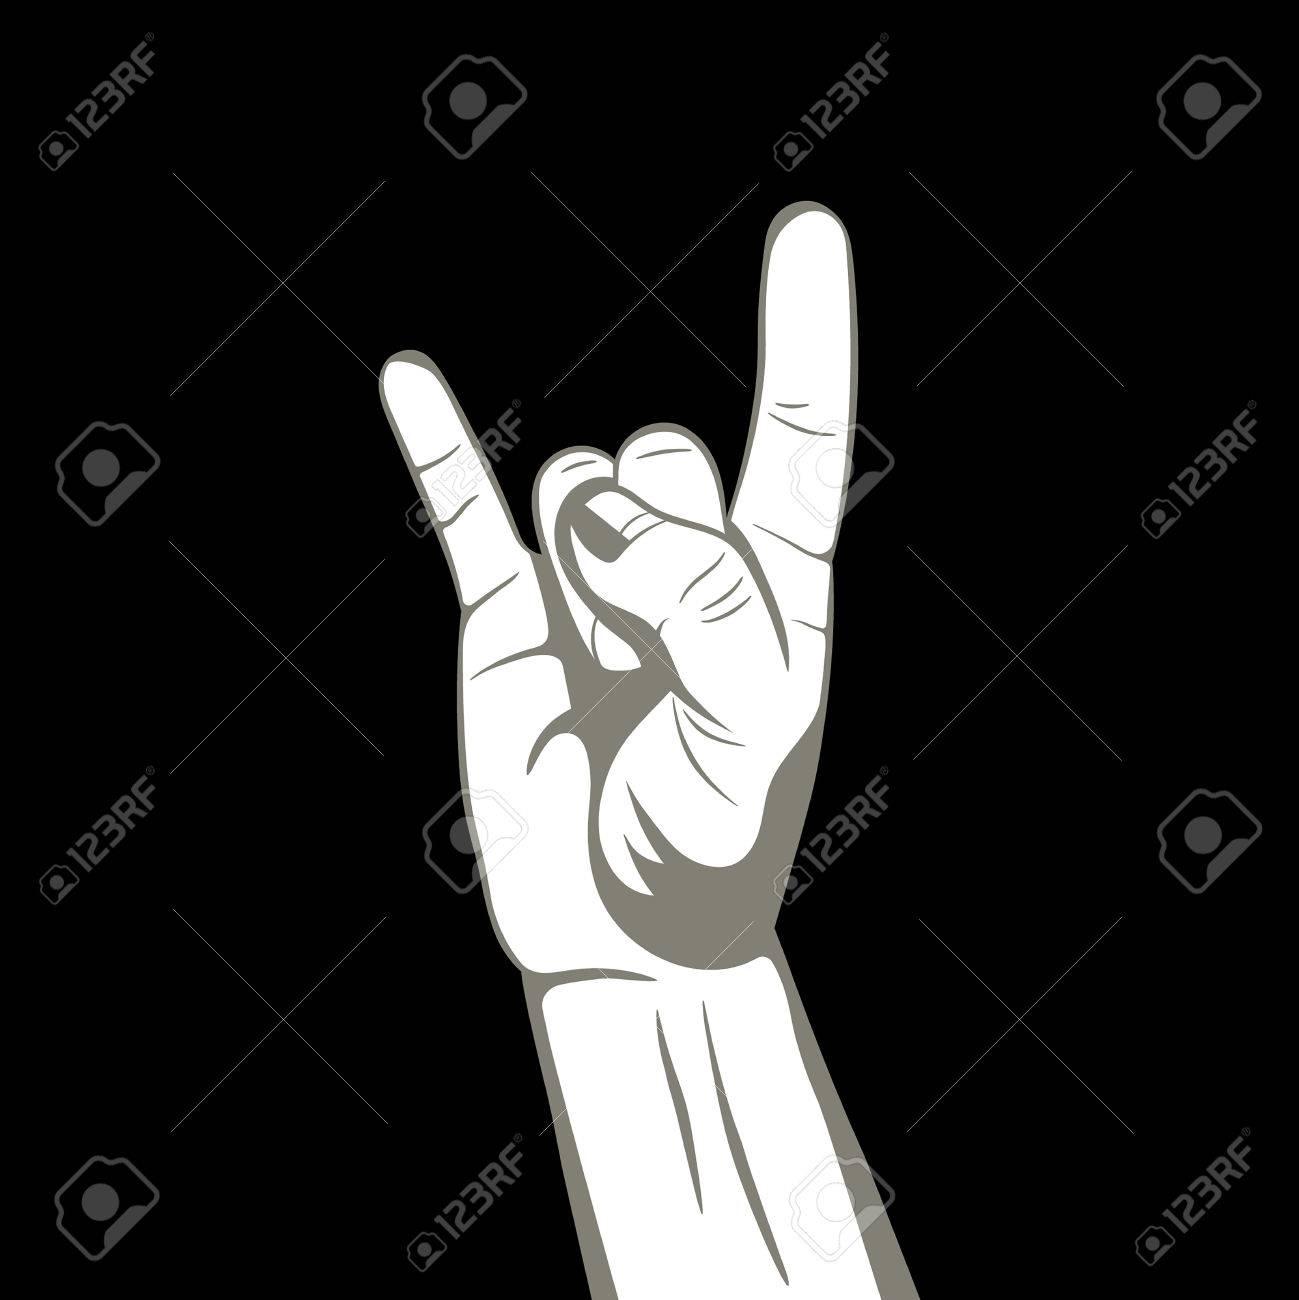 Hand with fingers upgn rocknrollmbol we togethere hand with fingers upgn rocknrollmbol we together buycottarizona